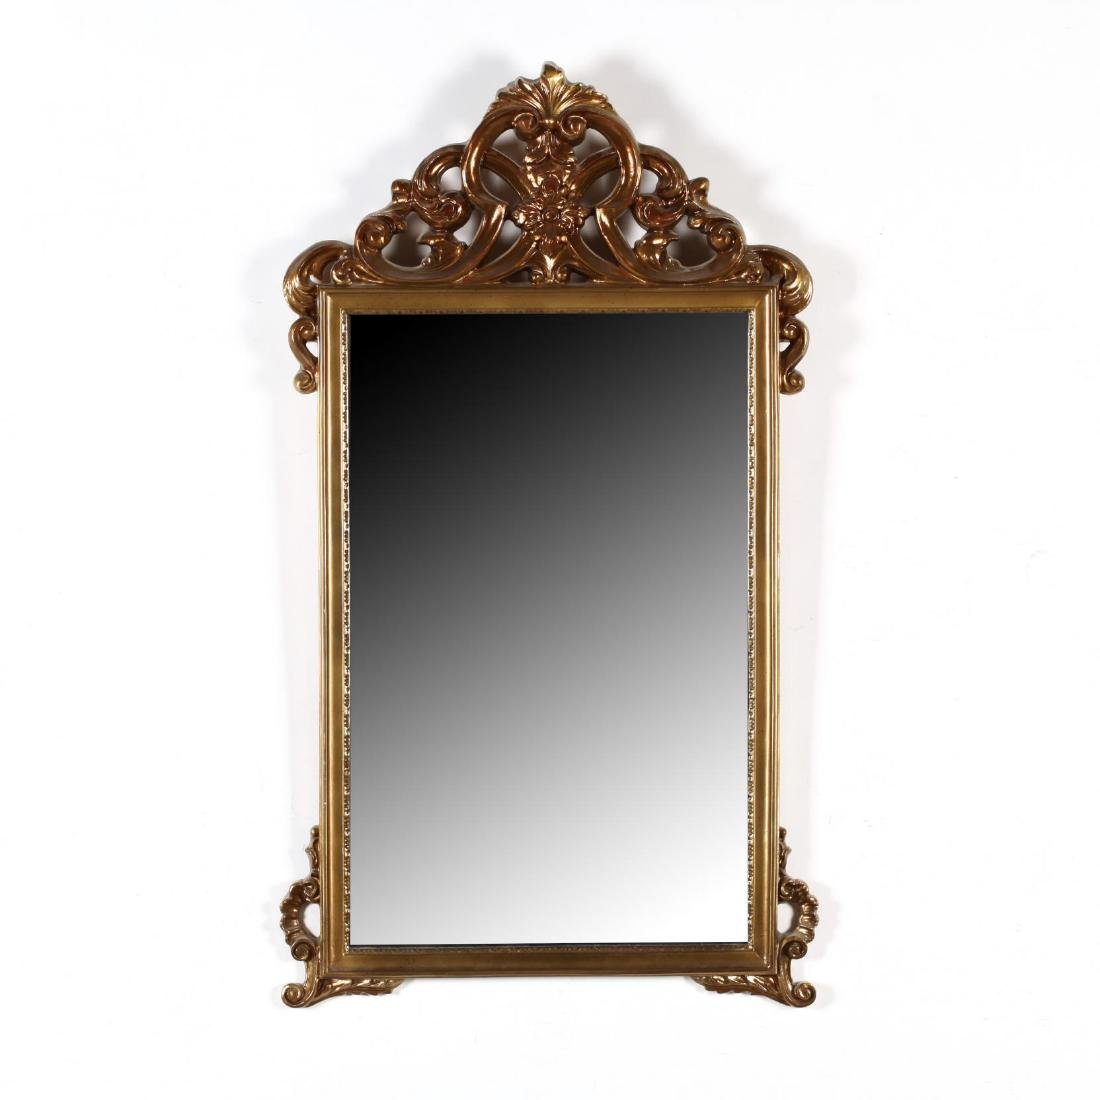 A Vintage Gilt Wall Mirror